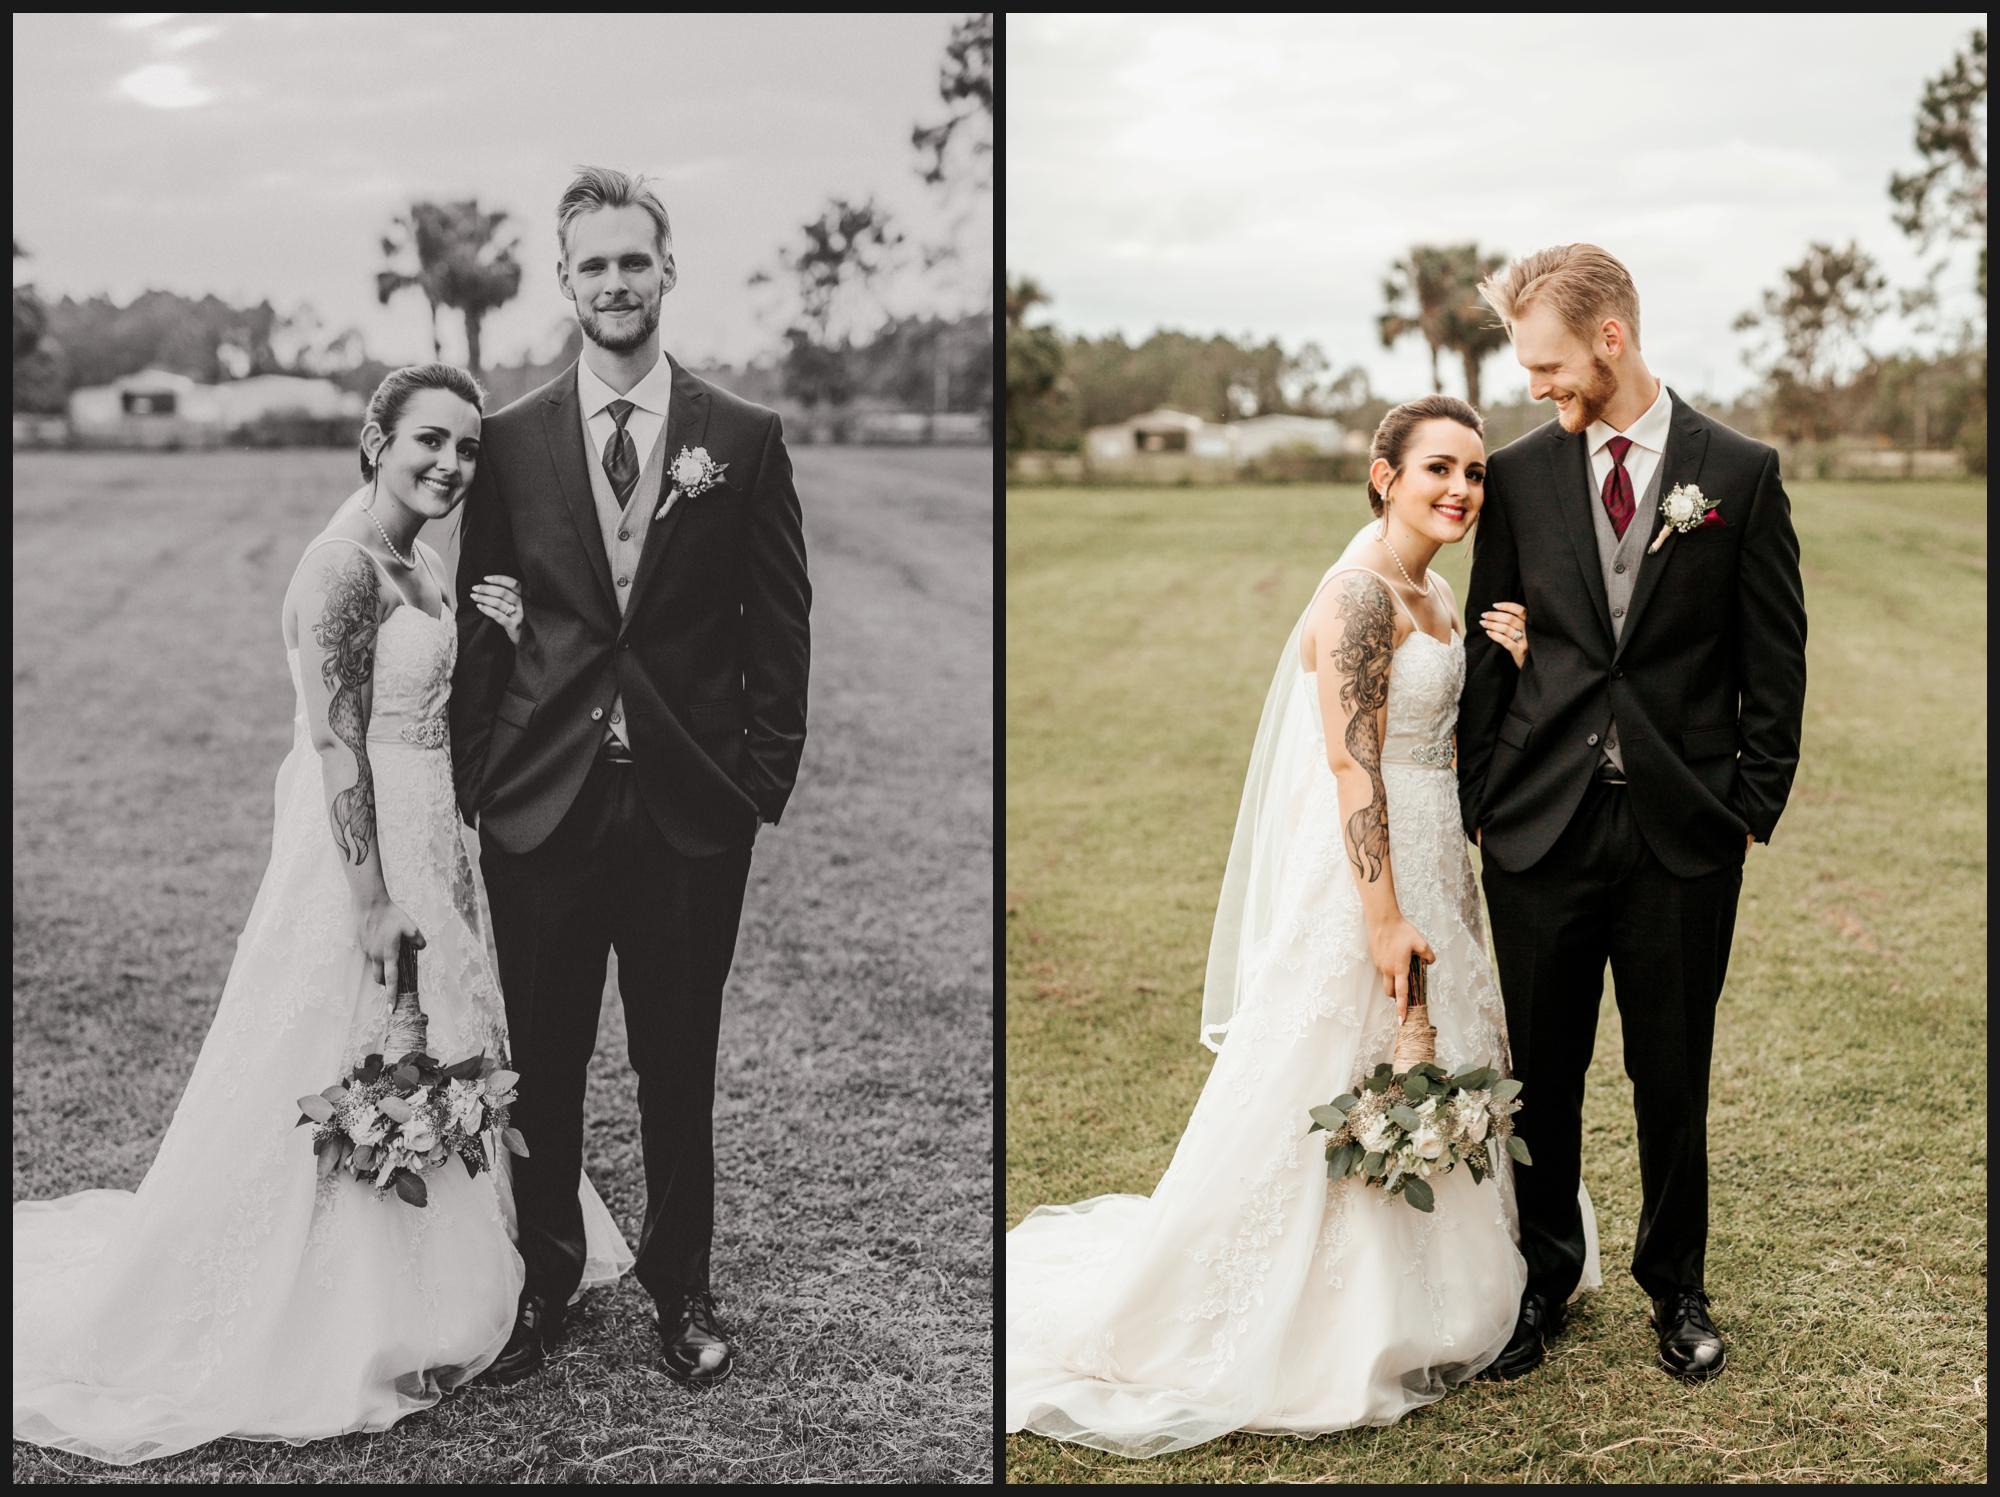 Orlando-Wedding-Photographer-destination-wedding-photographer-florida-wedding-photographer-bohemian-wedding-photographer_0292.jpg